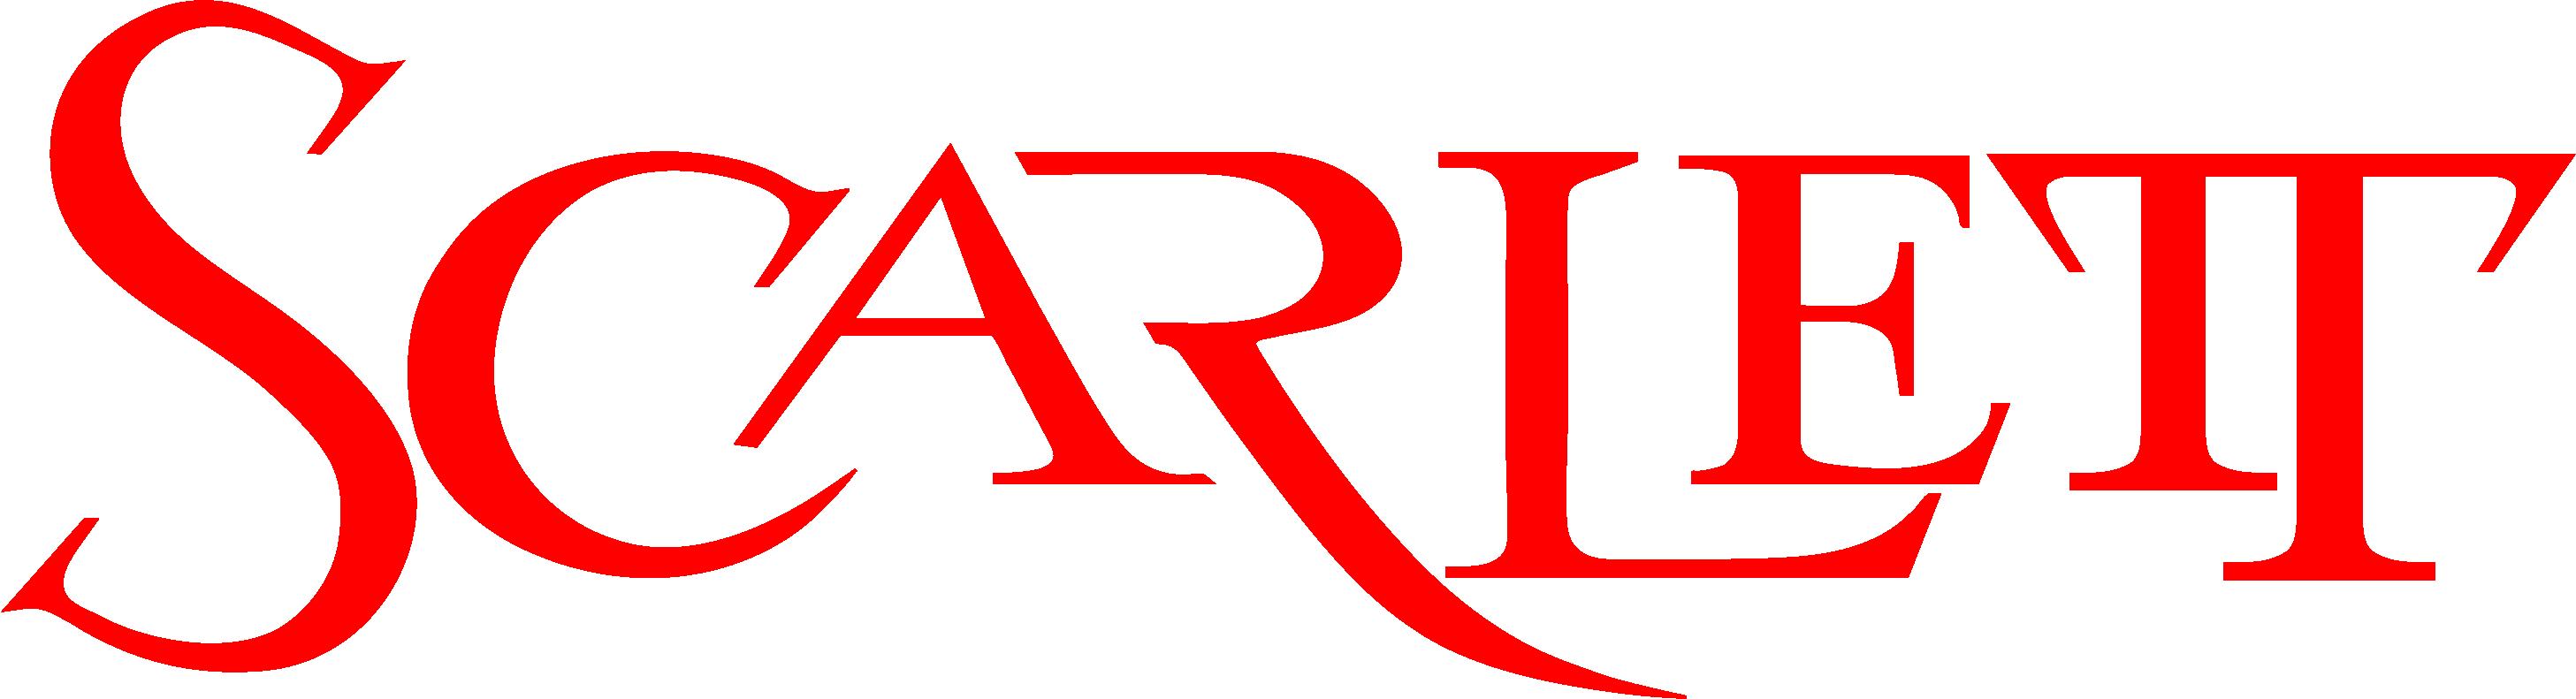 Scarlett Logo Rot